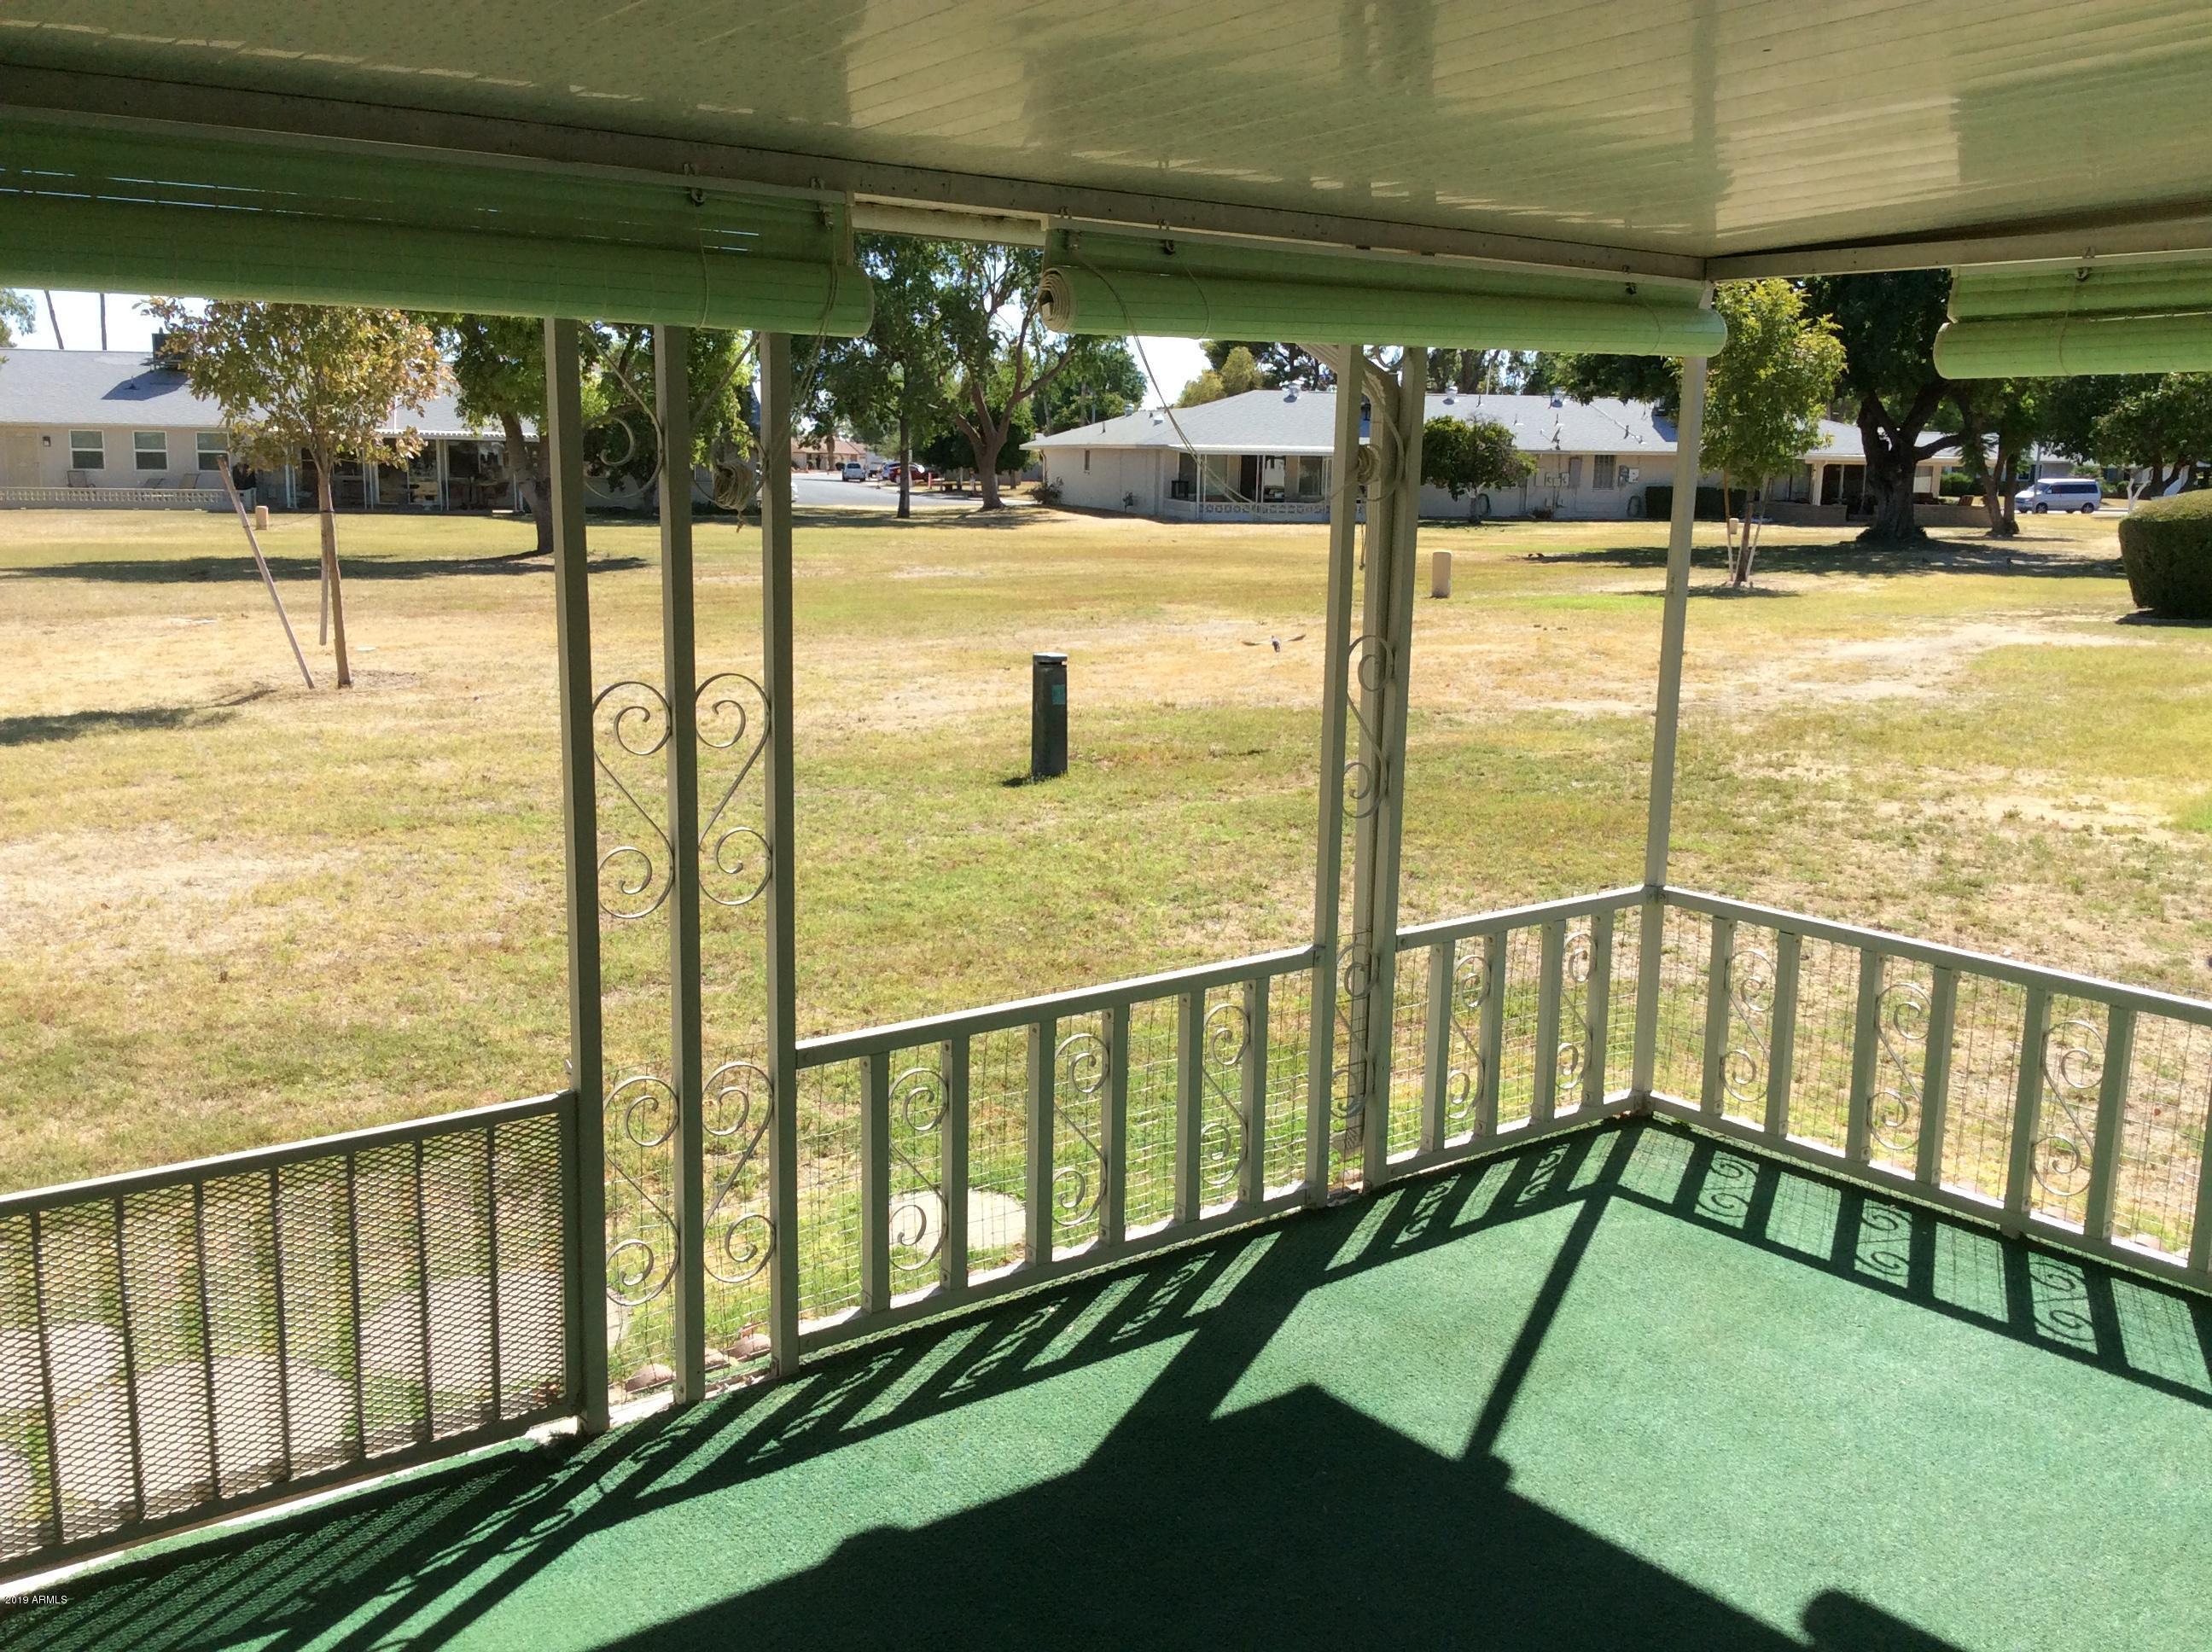 MLS 5949175 10309 W BRIGHT ANGEL Circle, Sun City, AZ 85351 Sun City AZ Condo or Townhome